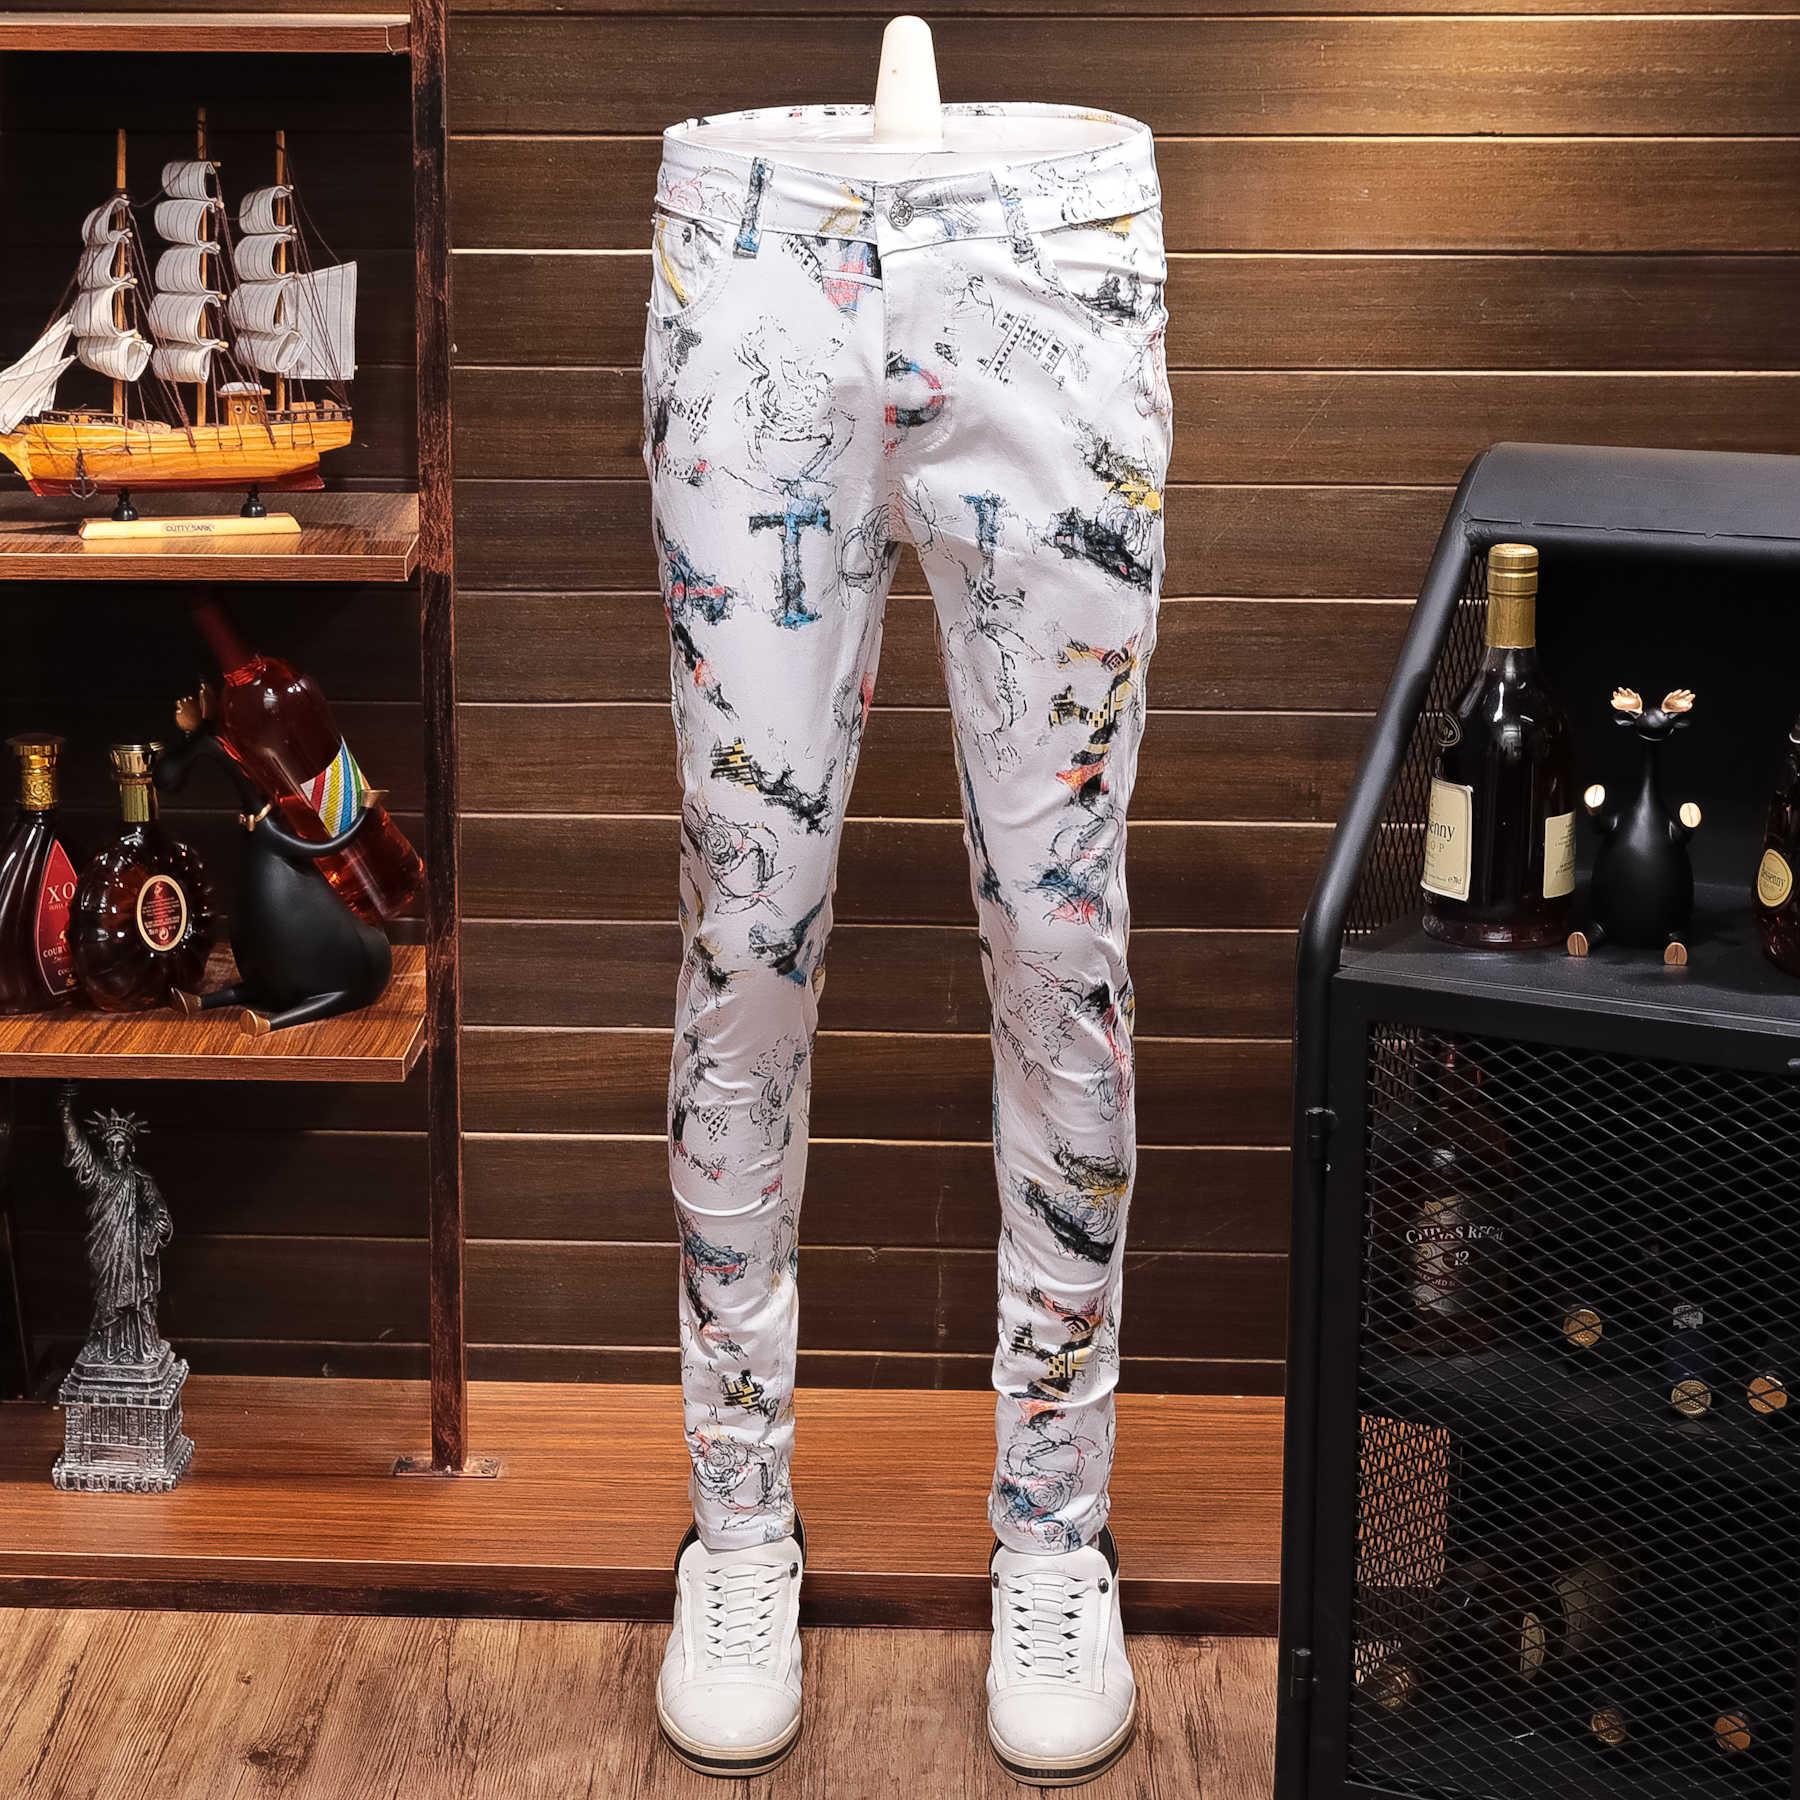 White Printing Man Jeans Leisure Time Long Pants Tide Jeans Men Slim Straight Stretch Jeans Designer Pants Nightclubs Singers